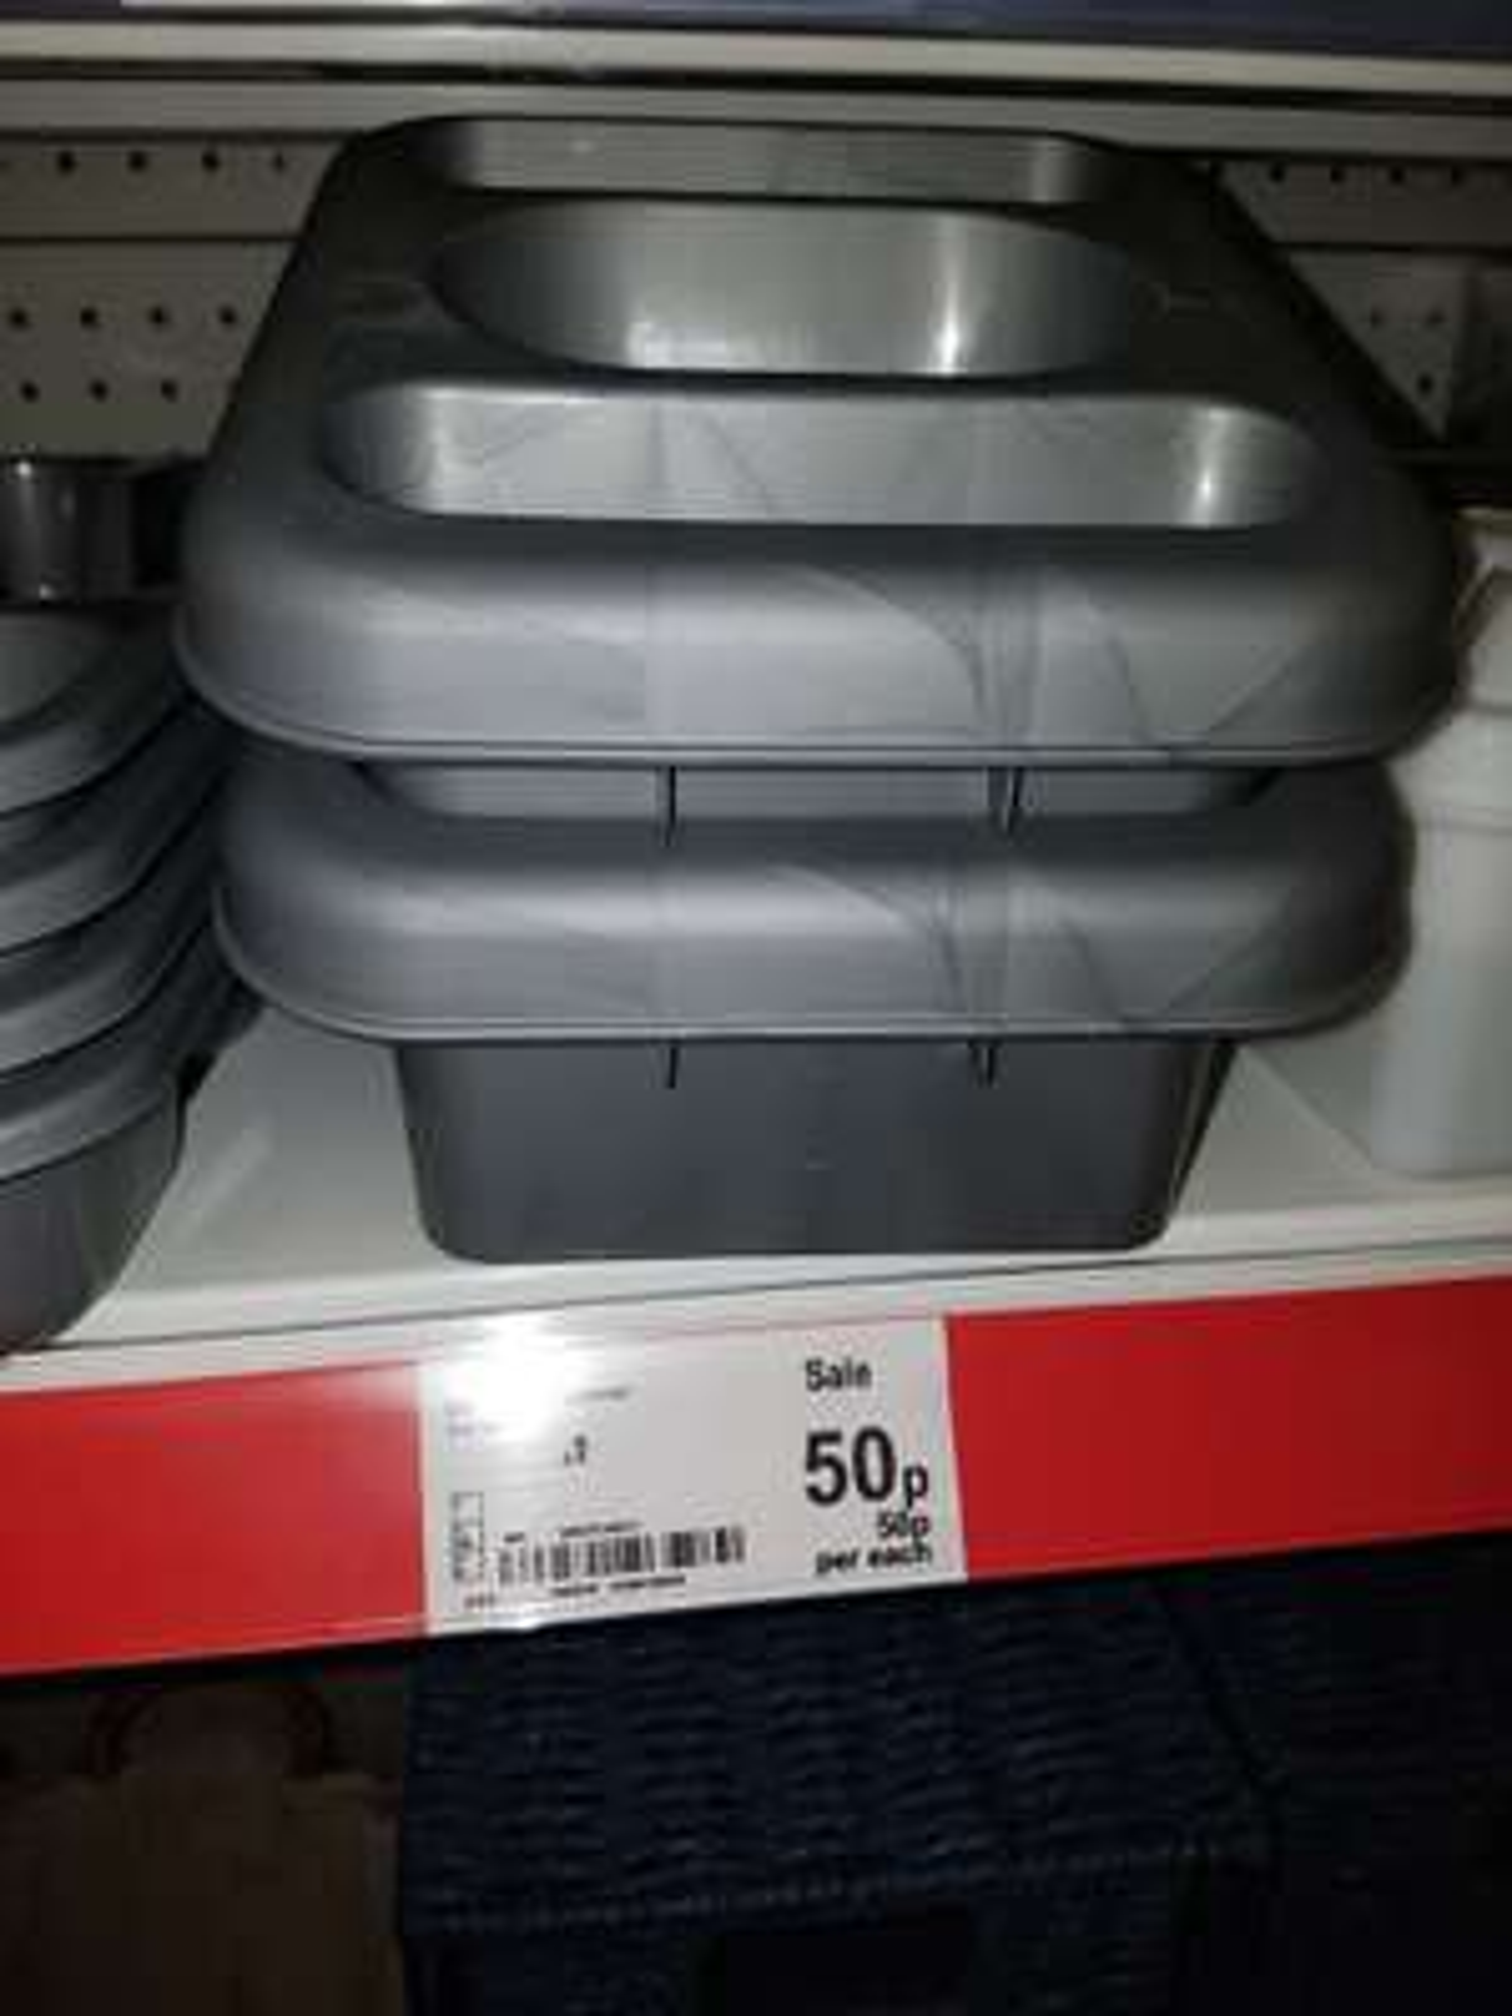 GEORGE HOME cutlery drainer - 50p instore @ ASDA (Hunts Cross)